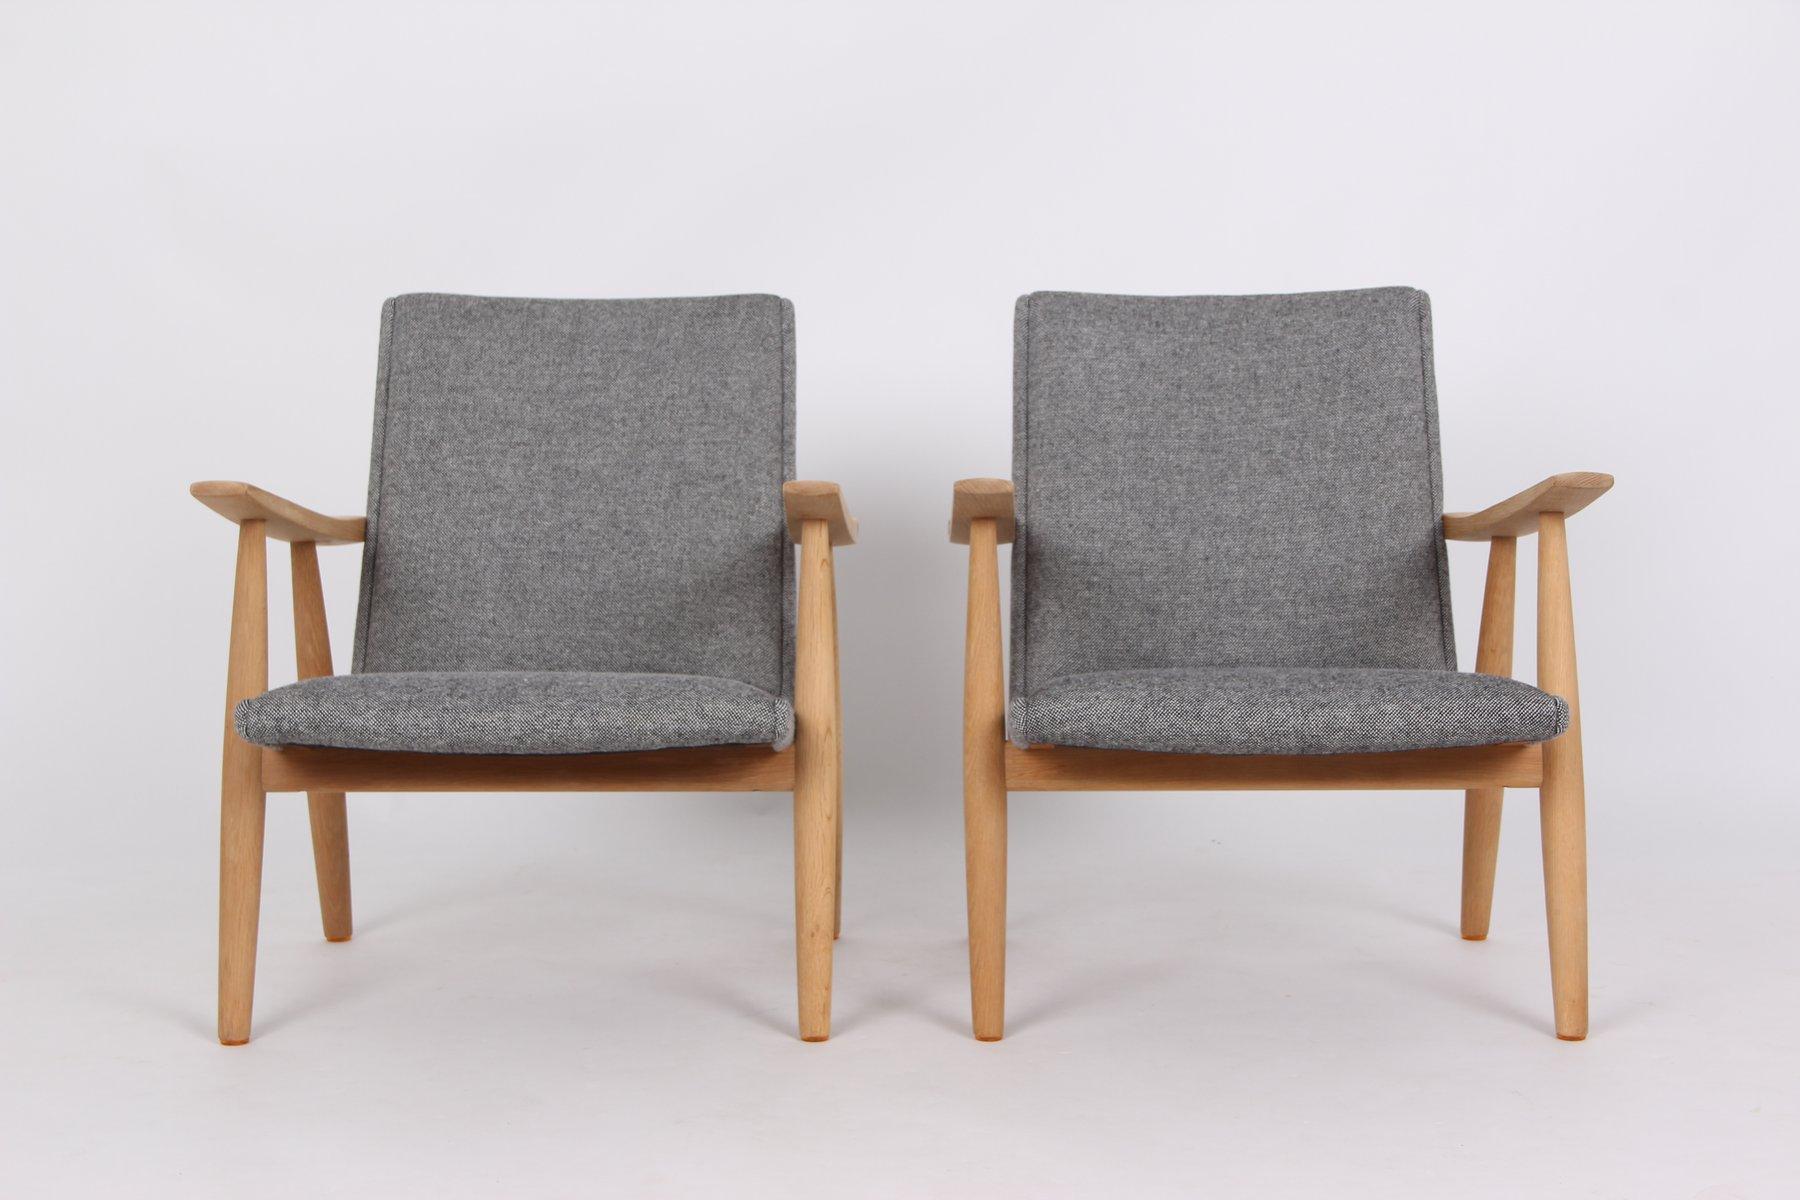 Wegner Sessel vintage ge260 sessel aus massiver eiche & wolle von hans j. wegner